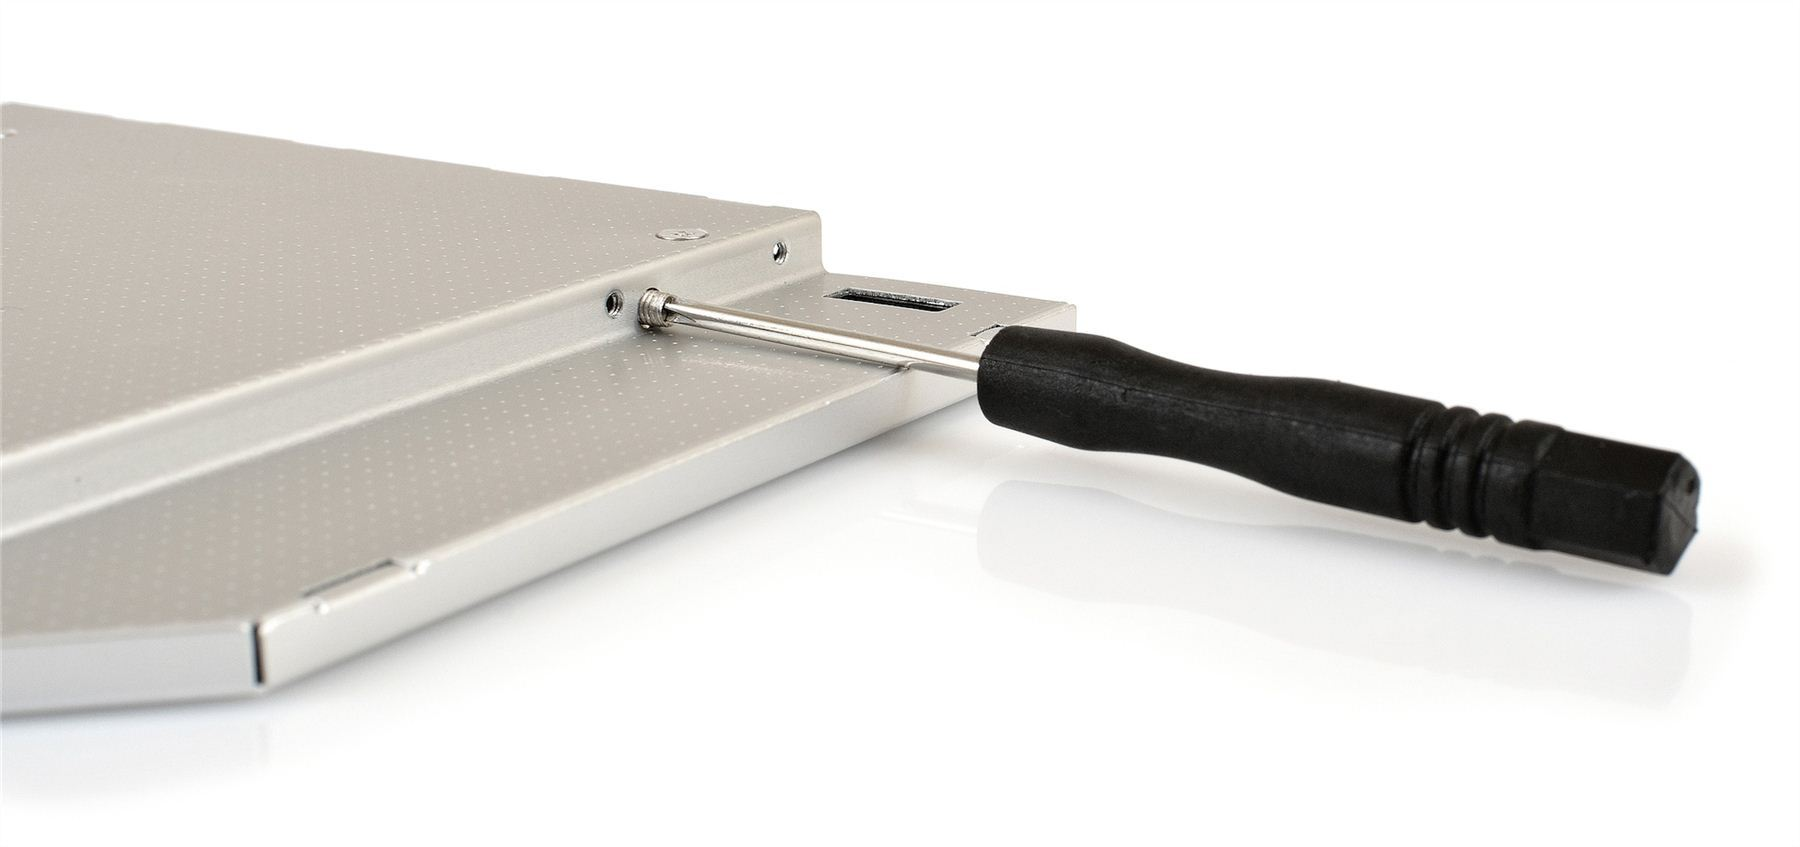 Opticaddy SATA-3 second HDD//SSD Caddy for Acer Aspire V5-471G V5-471G V5-471P